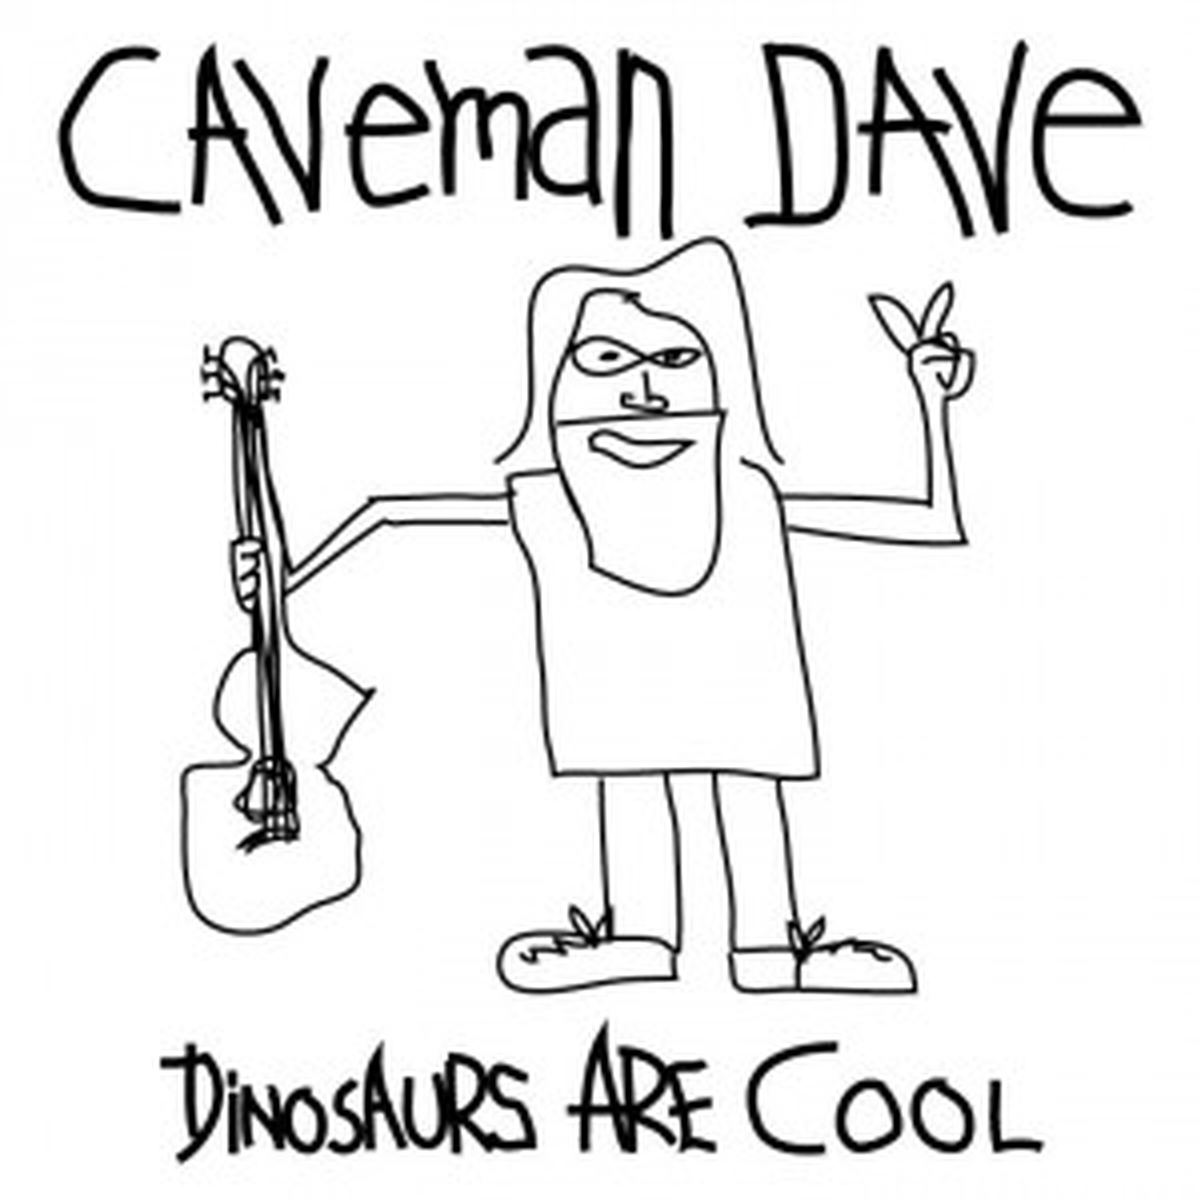 CavemanDave